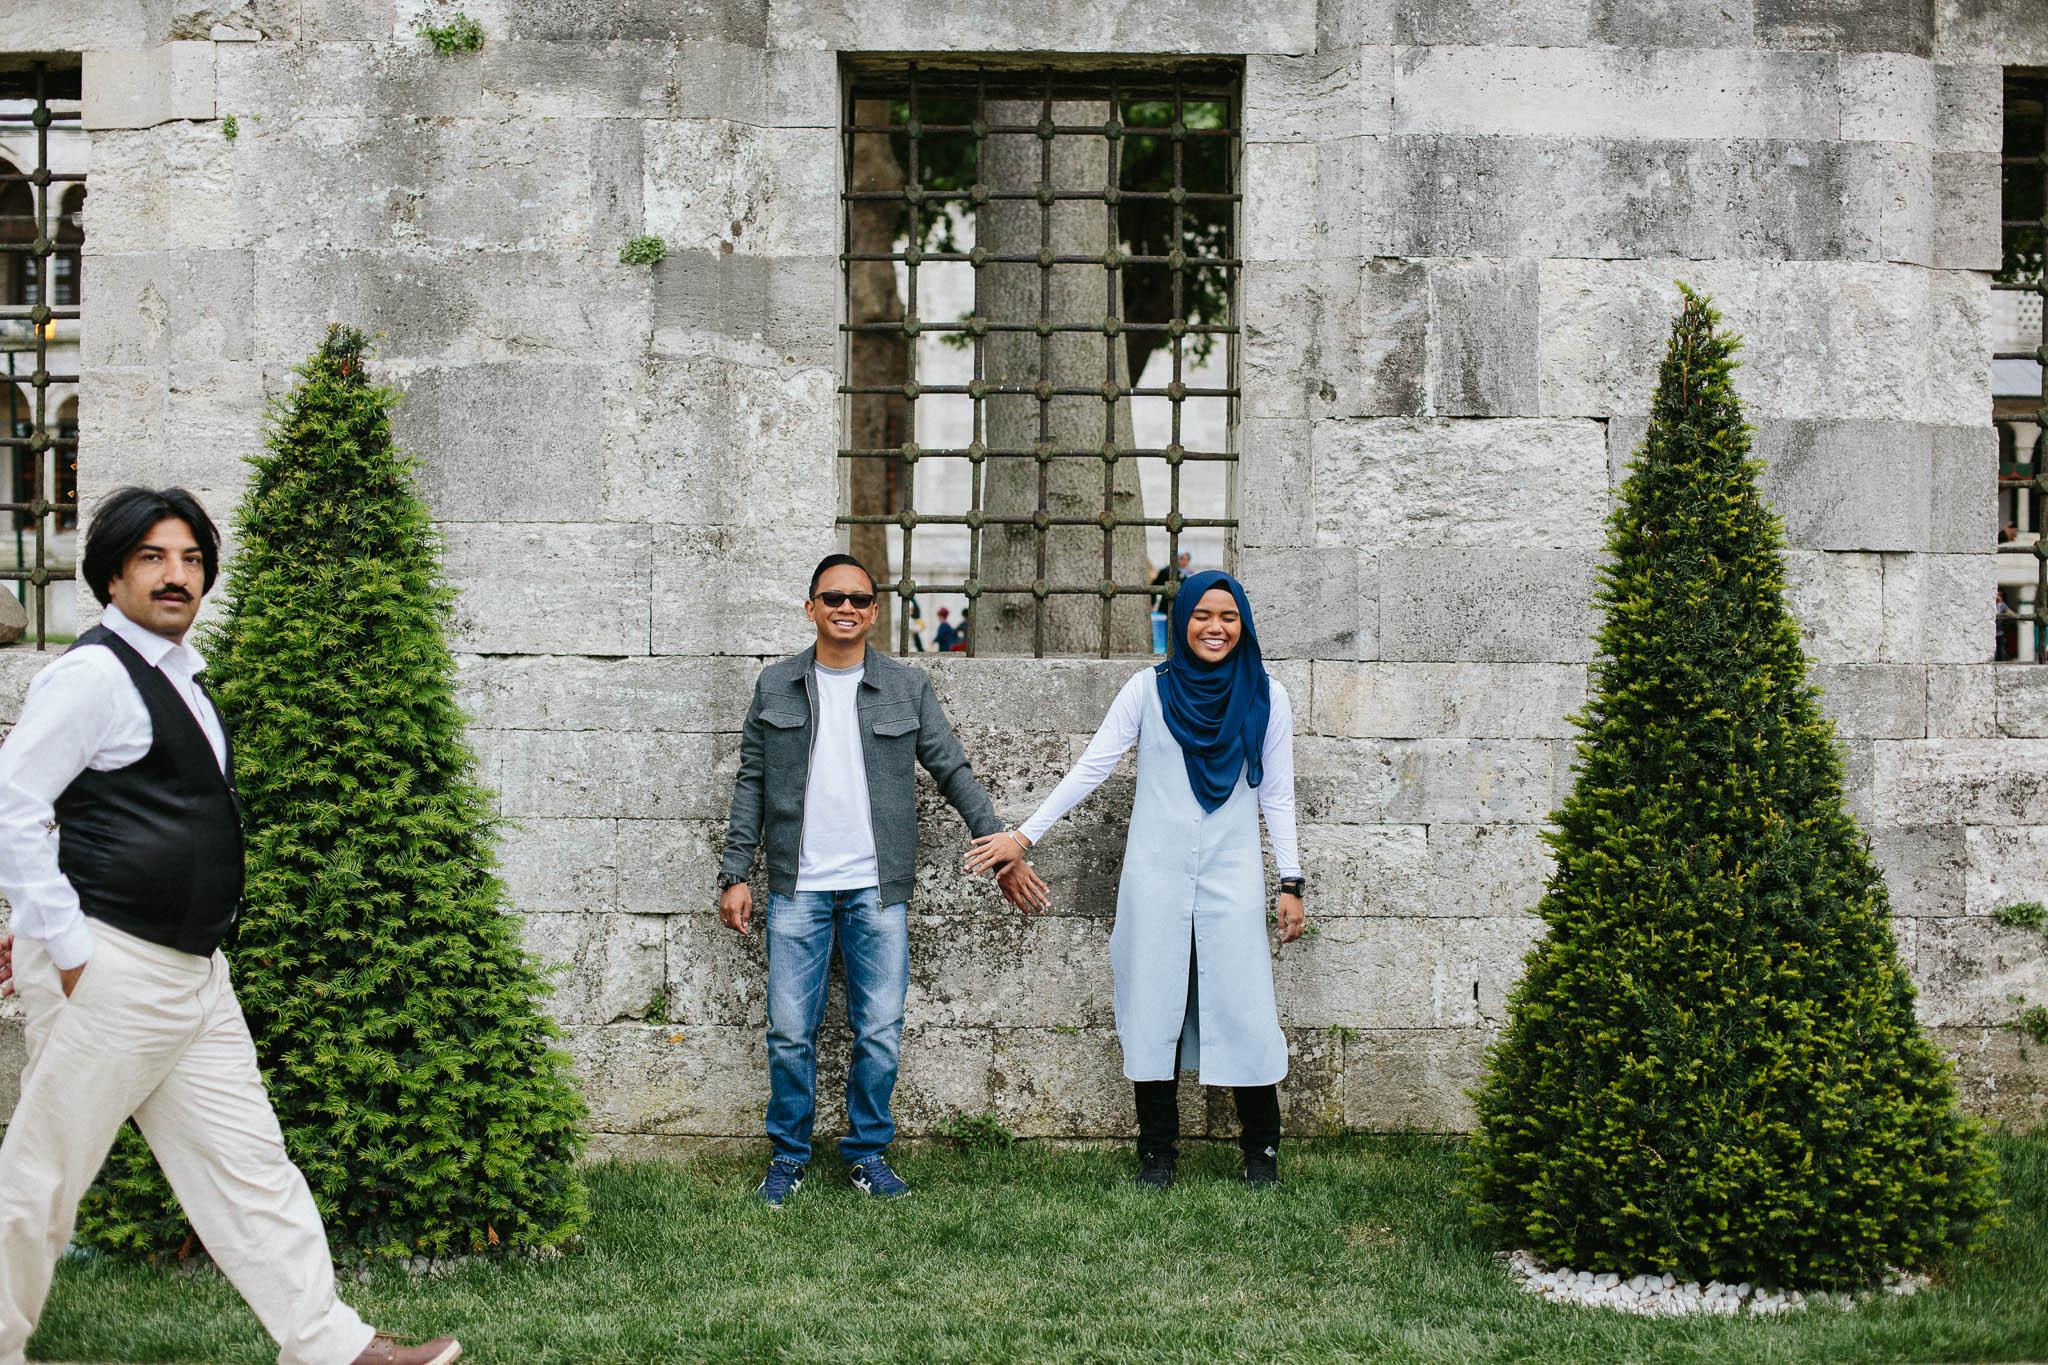 singapore-wedding-photographer-dzul-isma-istanbul-12.jpg